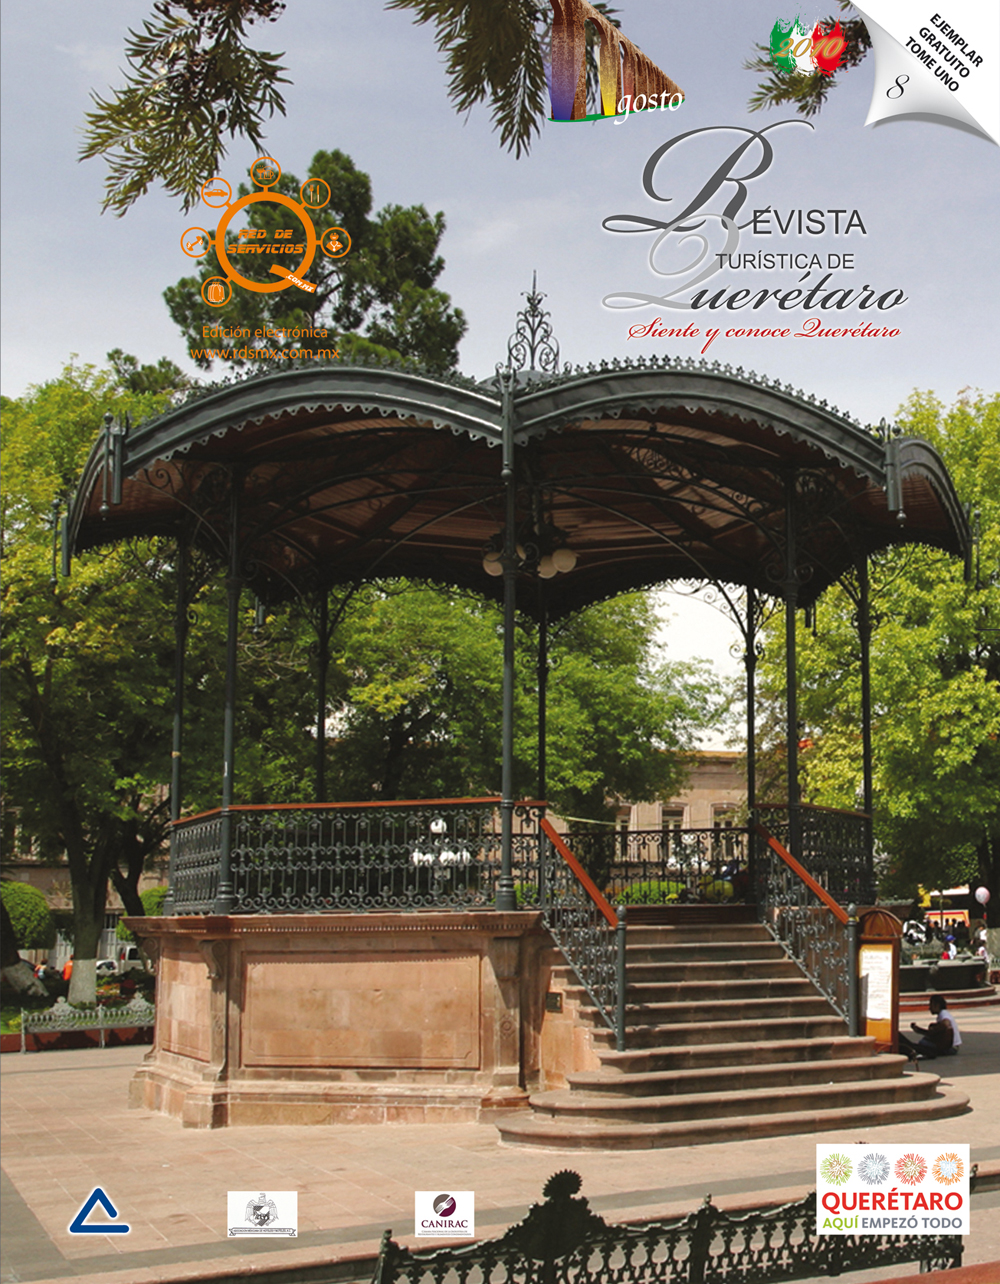 Revista tur stica de quer taro jard n zenea for Jardin zenea queretaro